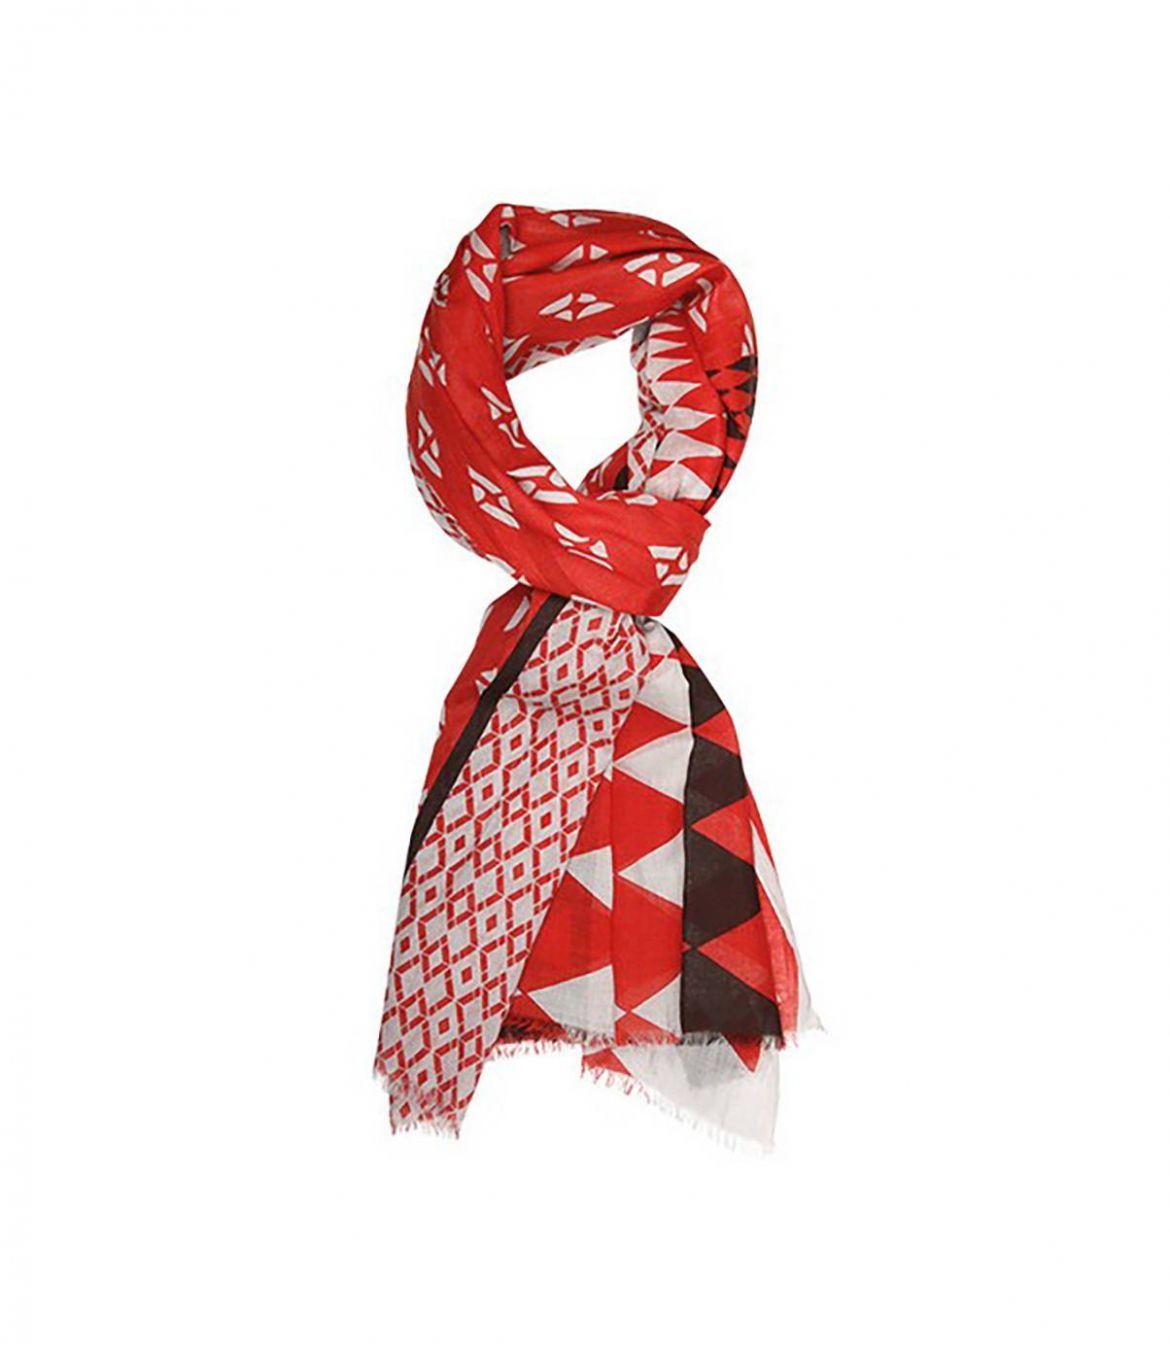 MARBRE Cotton scarf for men 100x200 cm Storiatipic - 1